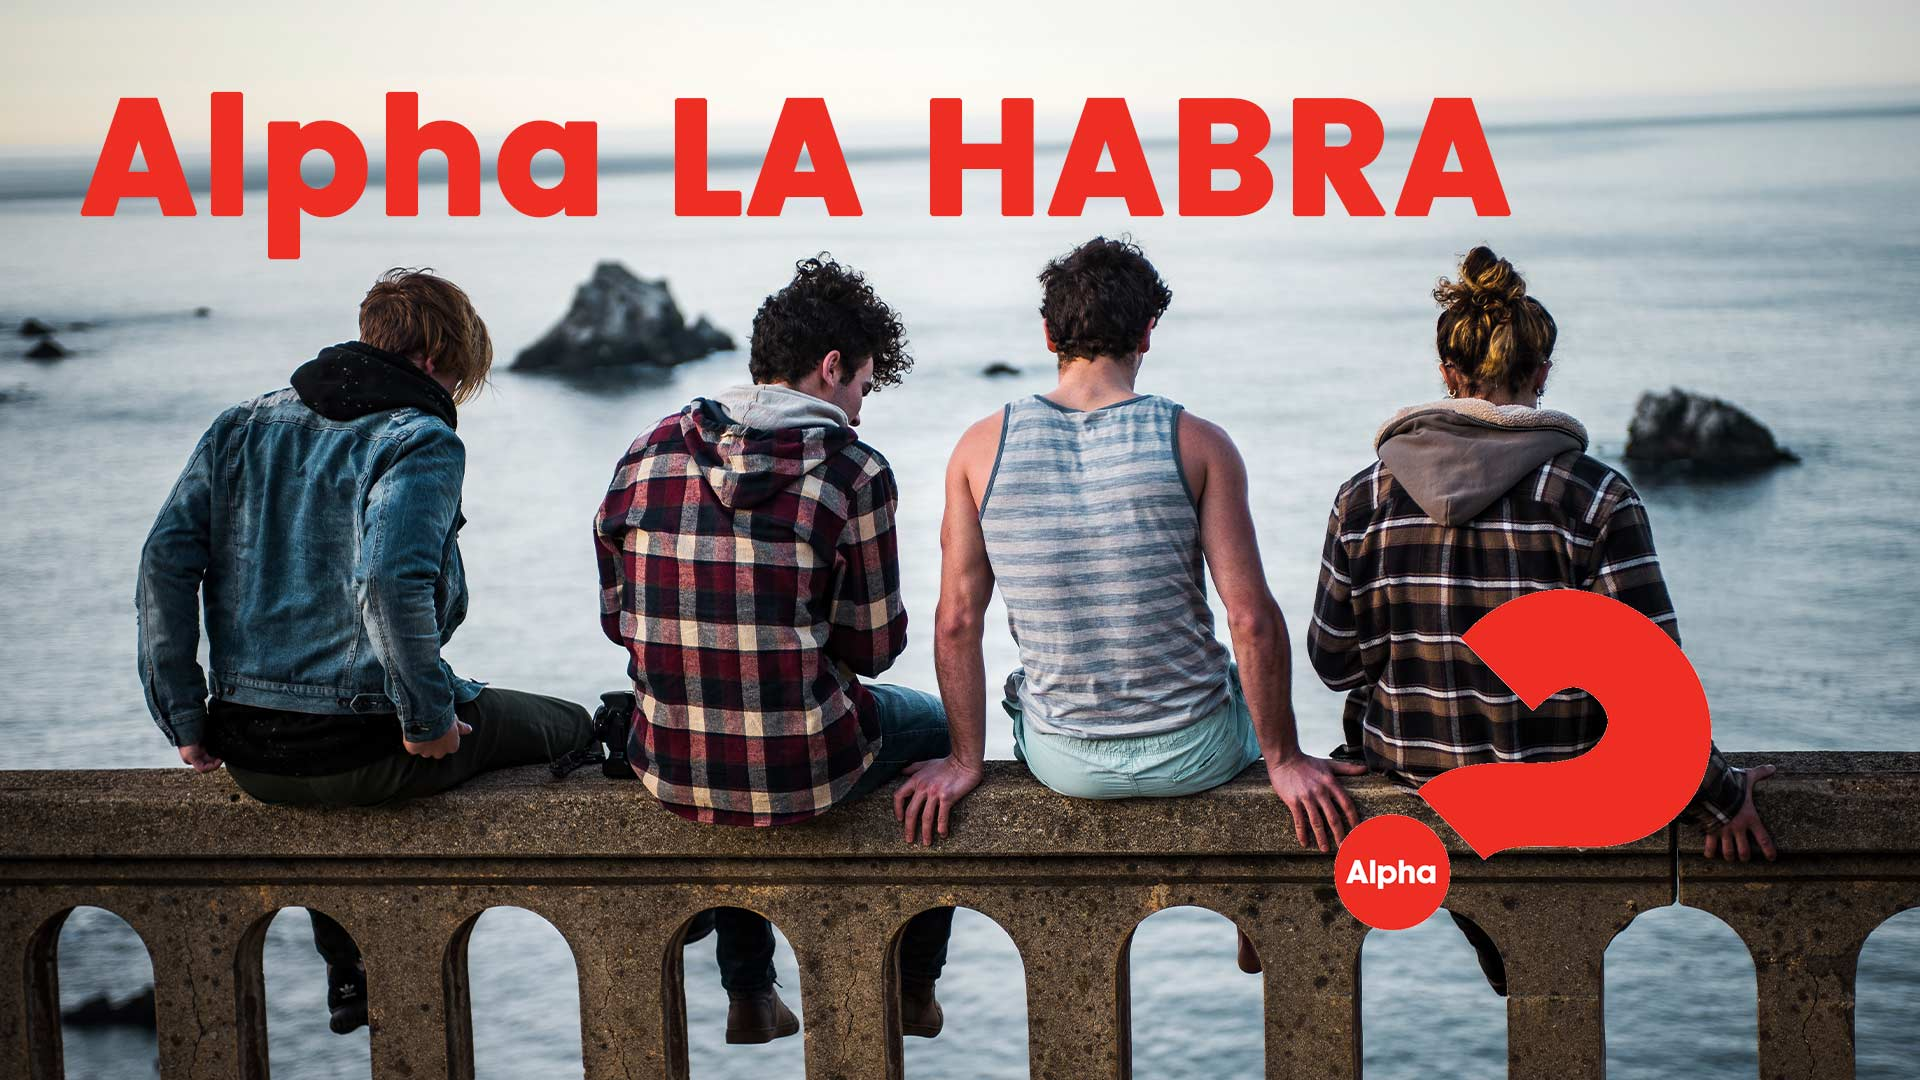 Alpha-La-Habra.jpg